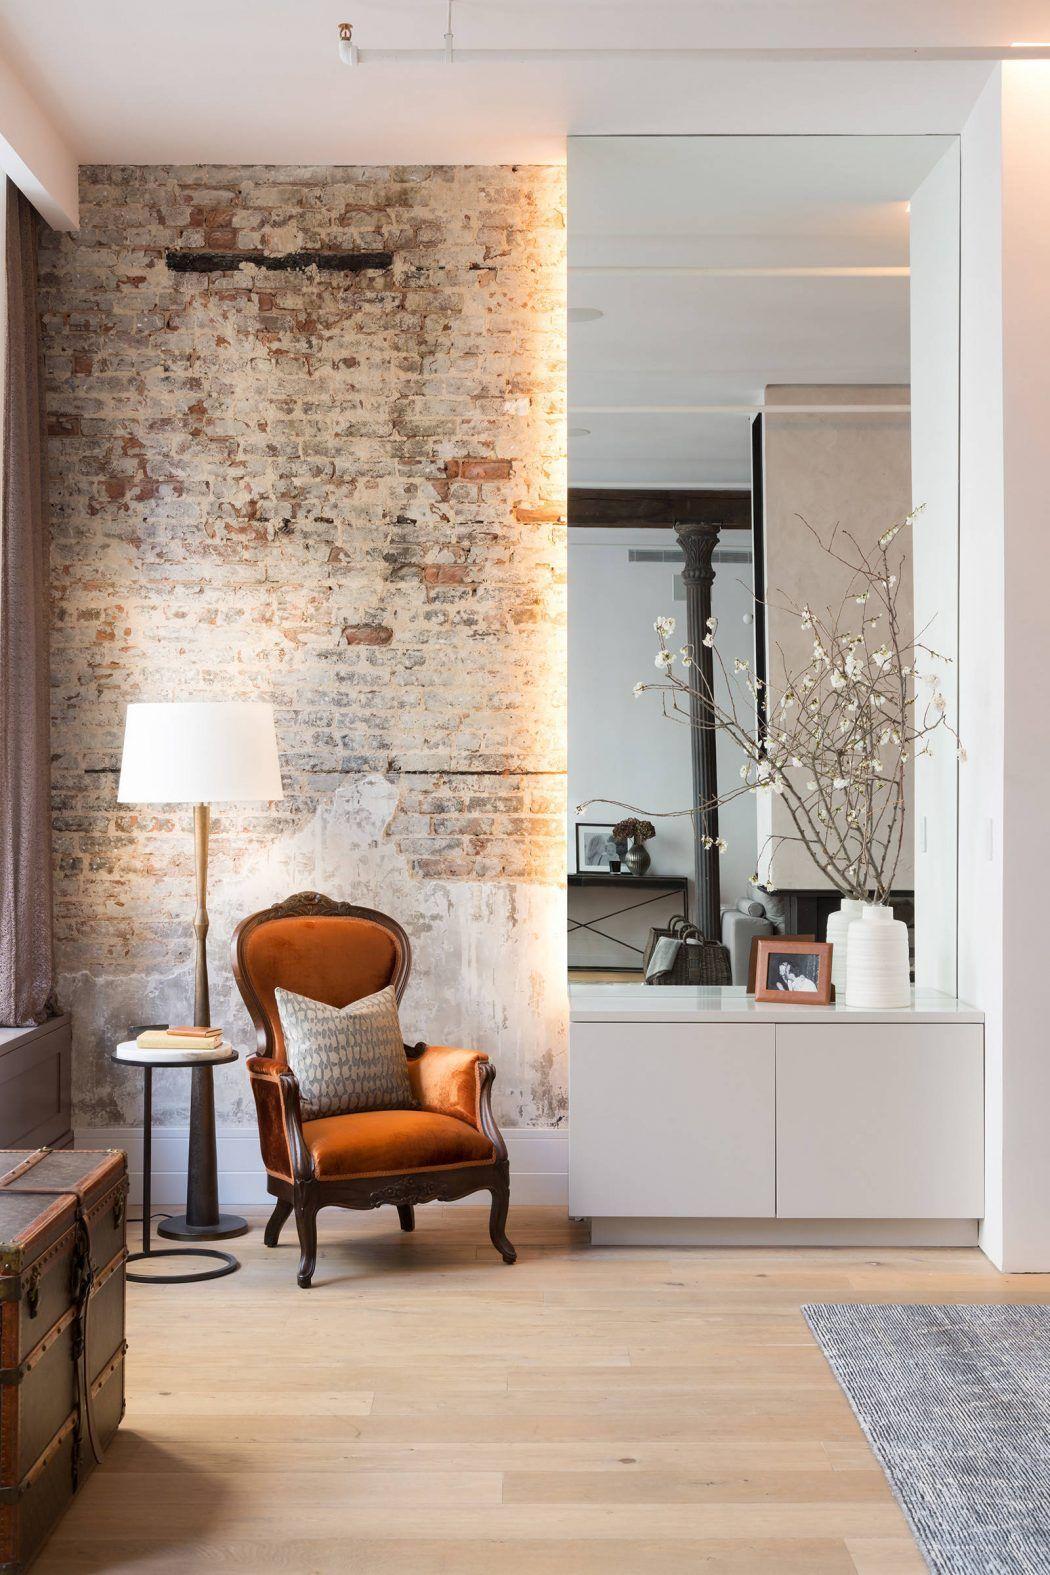 Tribeca loft by european home homeadore house of brews home